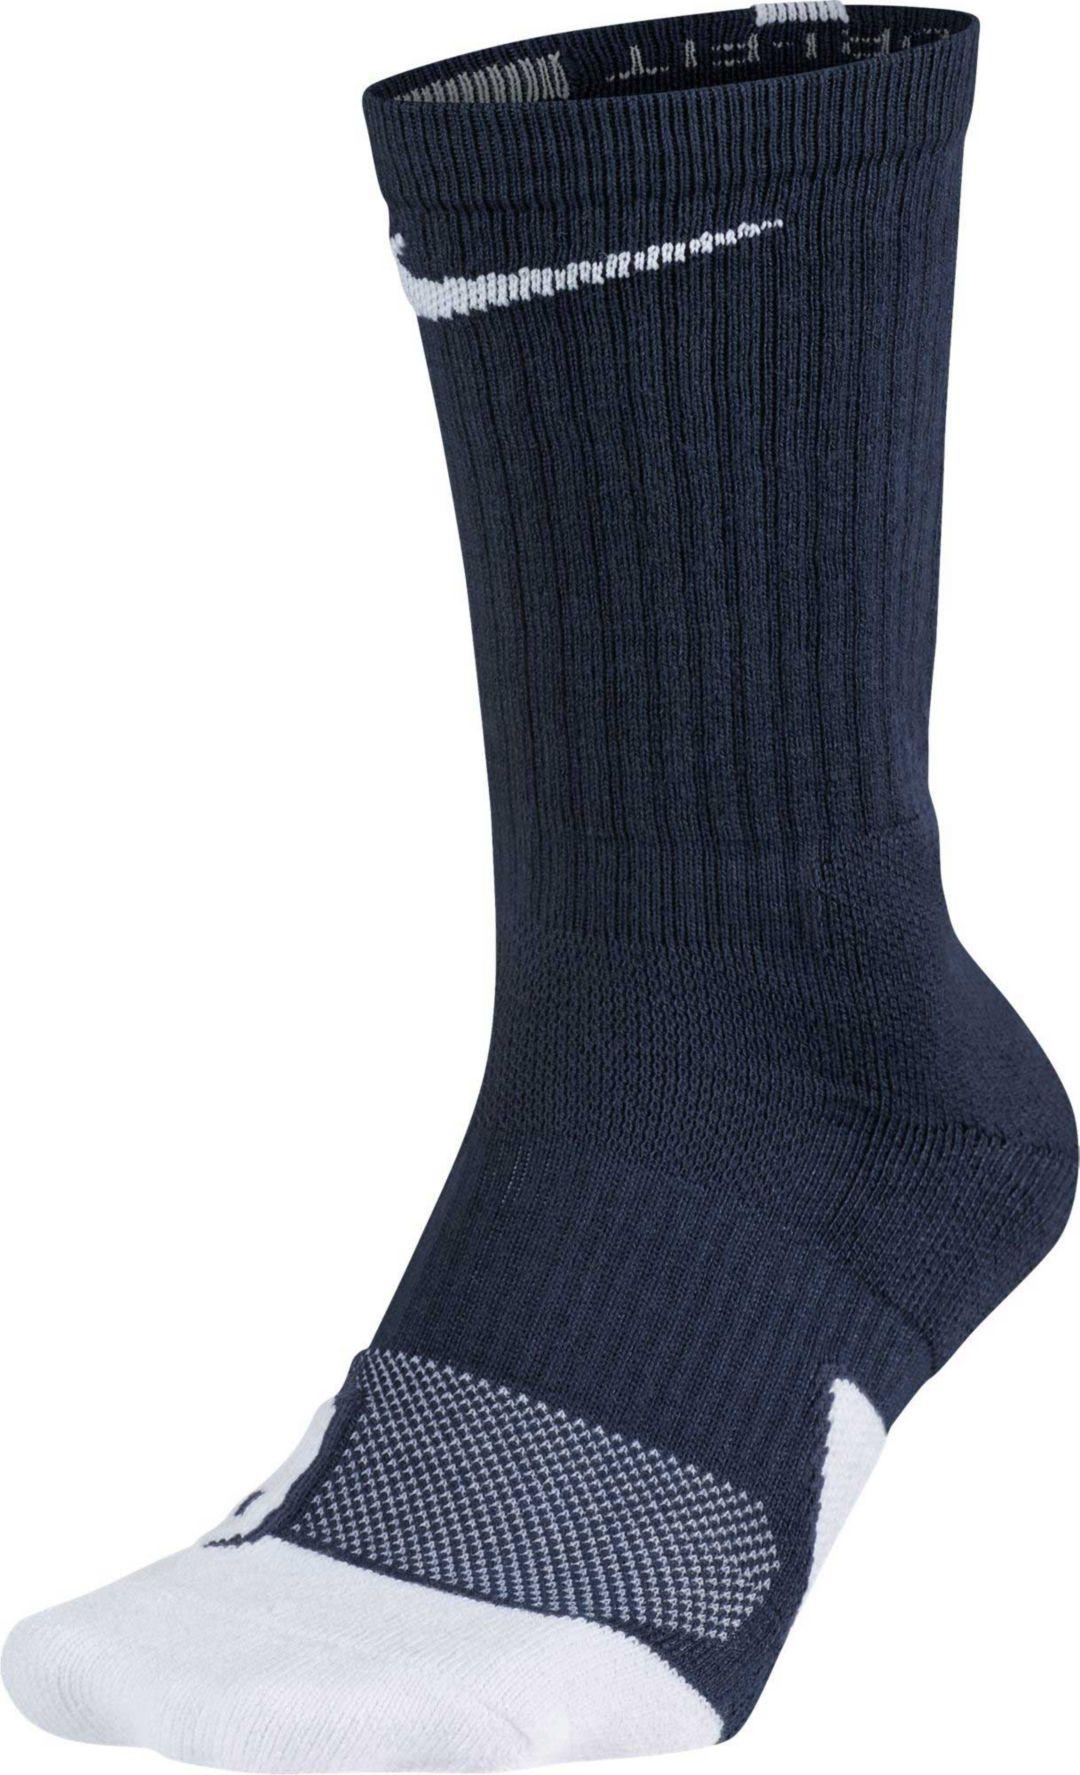 new style b50ea 0e2c6 Nike Dry Elite 1.5 Crew Basketball Socks 2